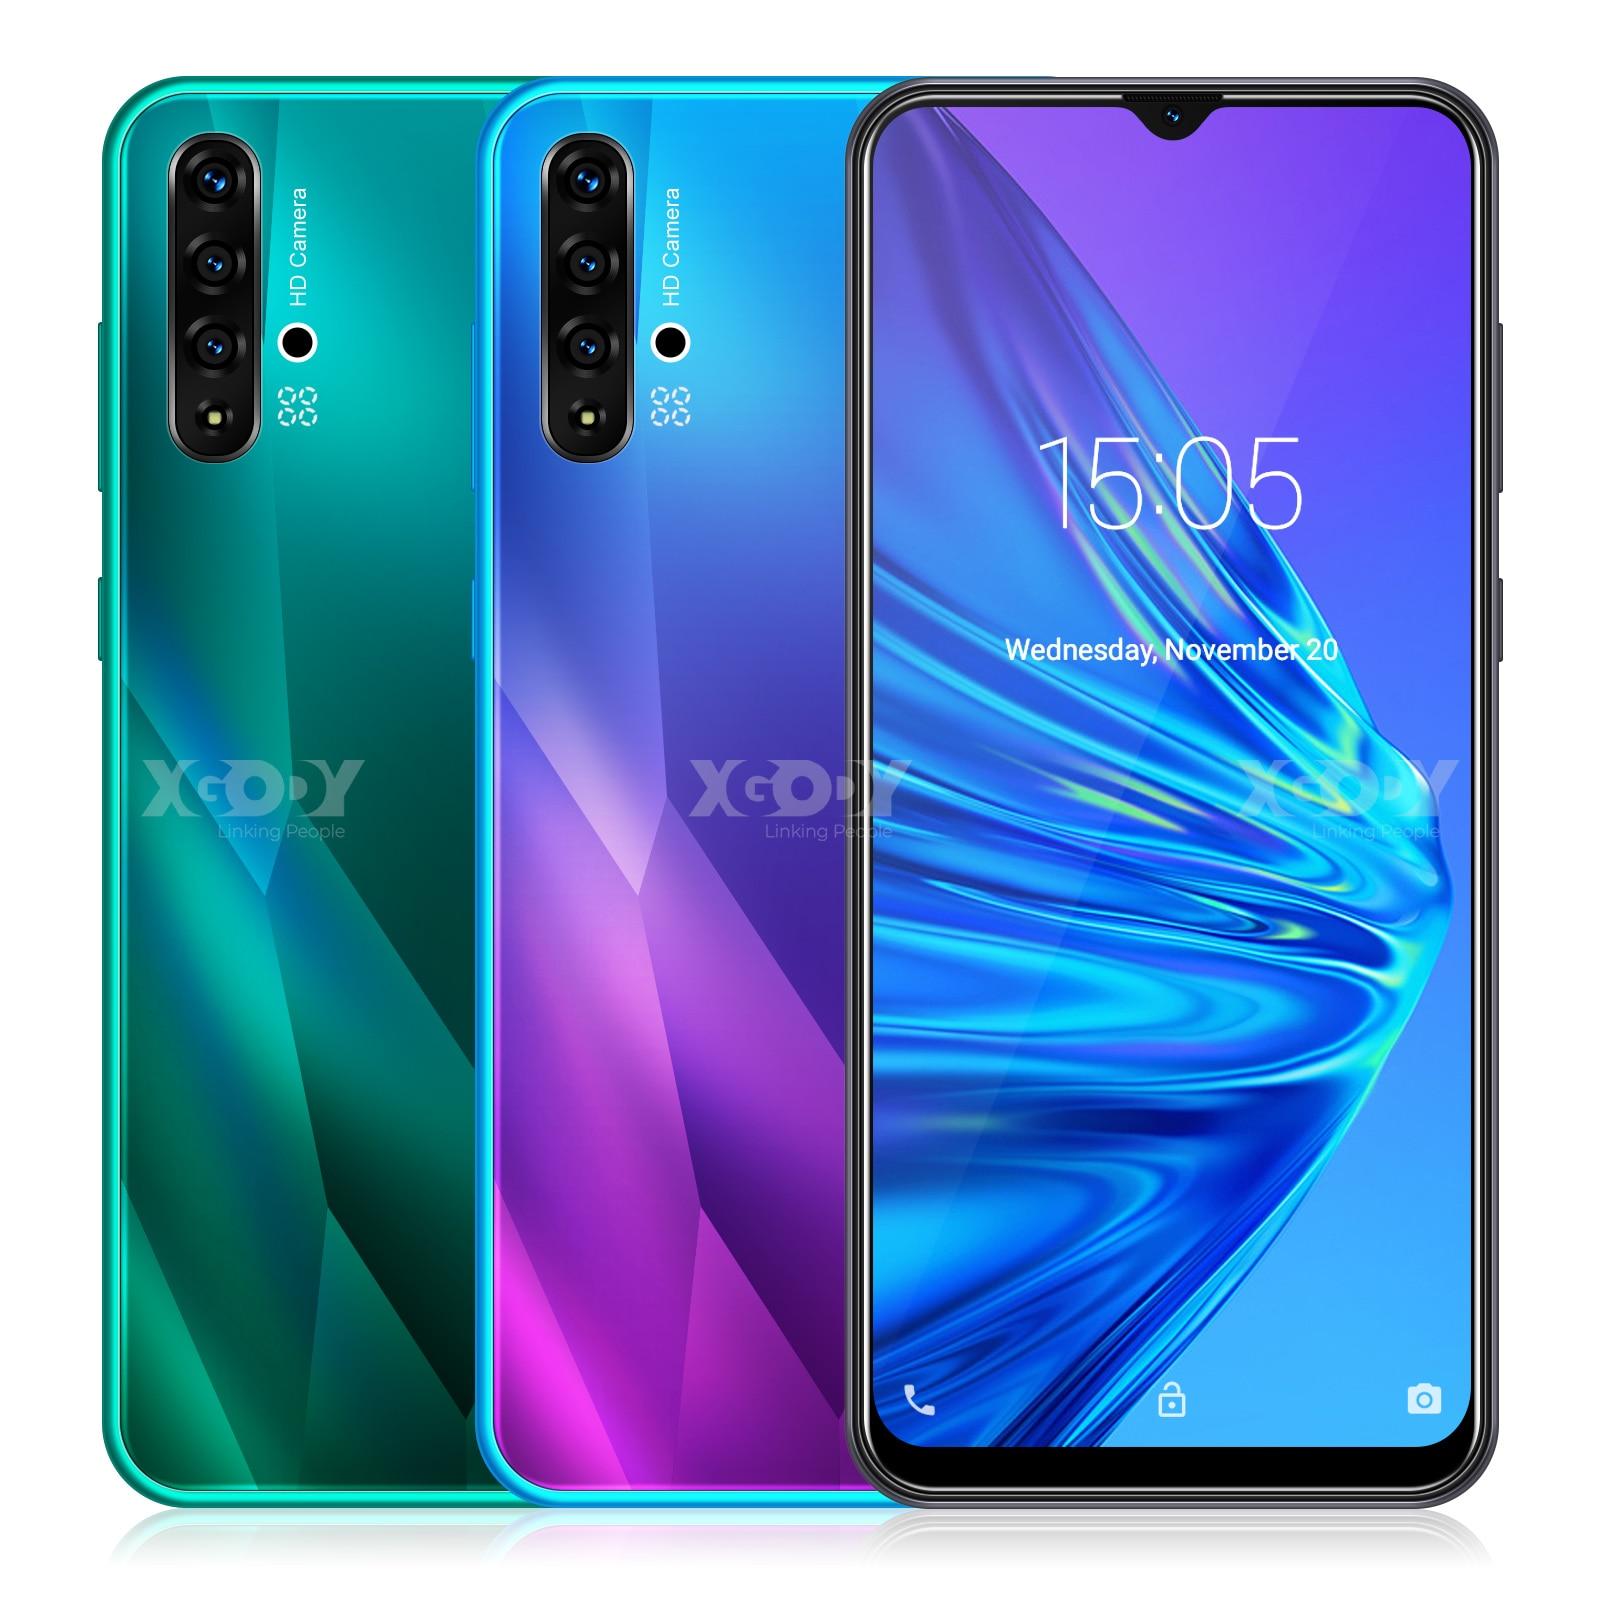 XGODY 6.5inch 19:9 Big Screen 3G Smartphone Android 9.0 1GB 4GB MTK6580 Quad Core 5MP Camera 3000mAh WIFI GPS Mobile Phone